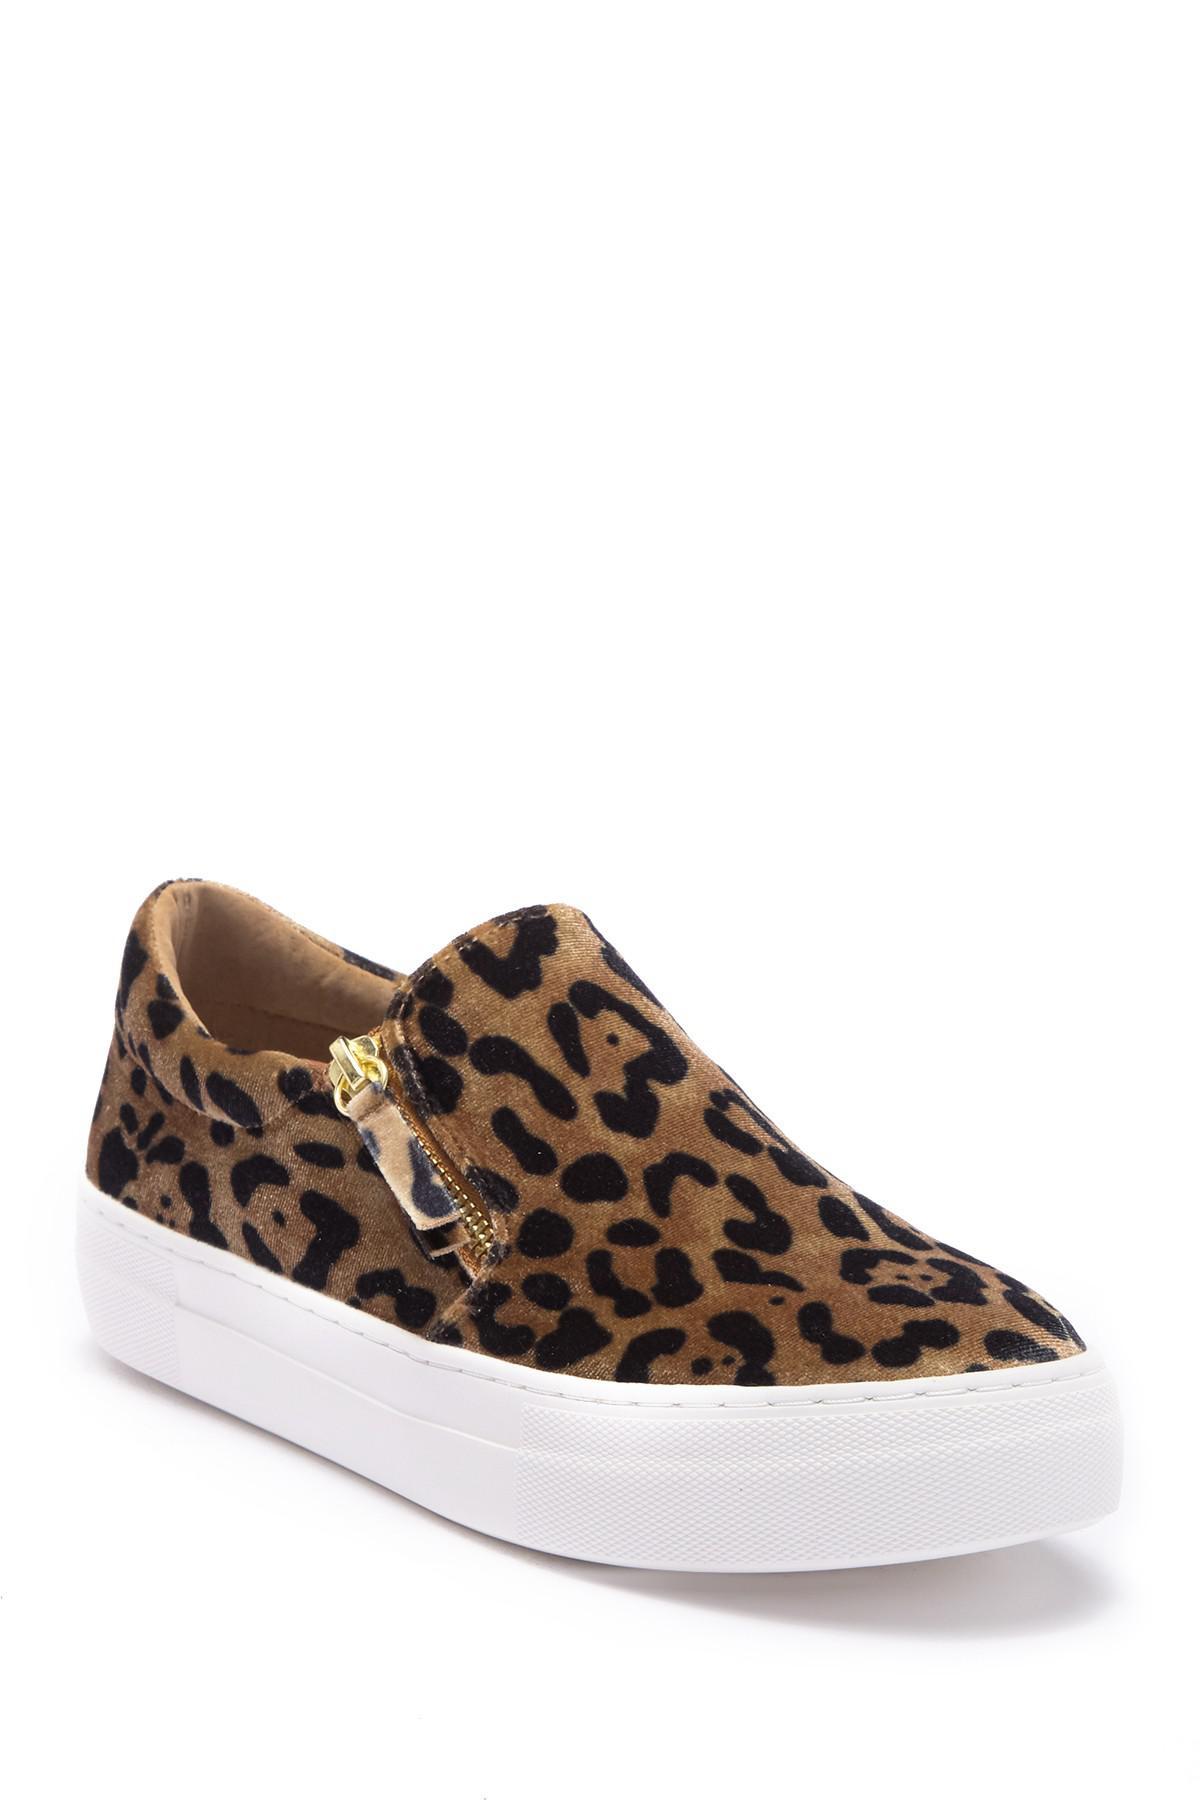 881f349e77b Lyst - Steve Madden Glaammar Zip Embossed Sneaker in Brown